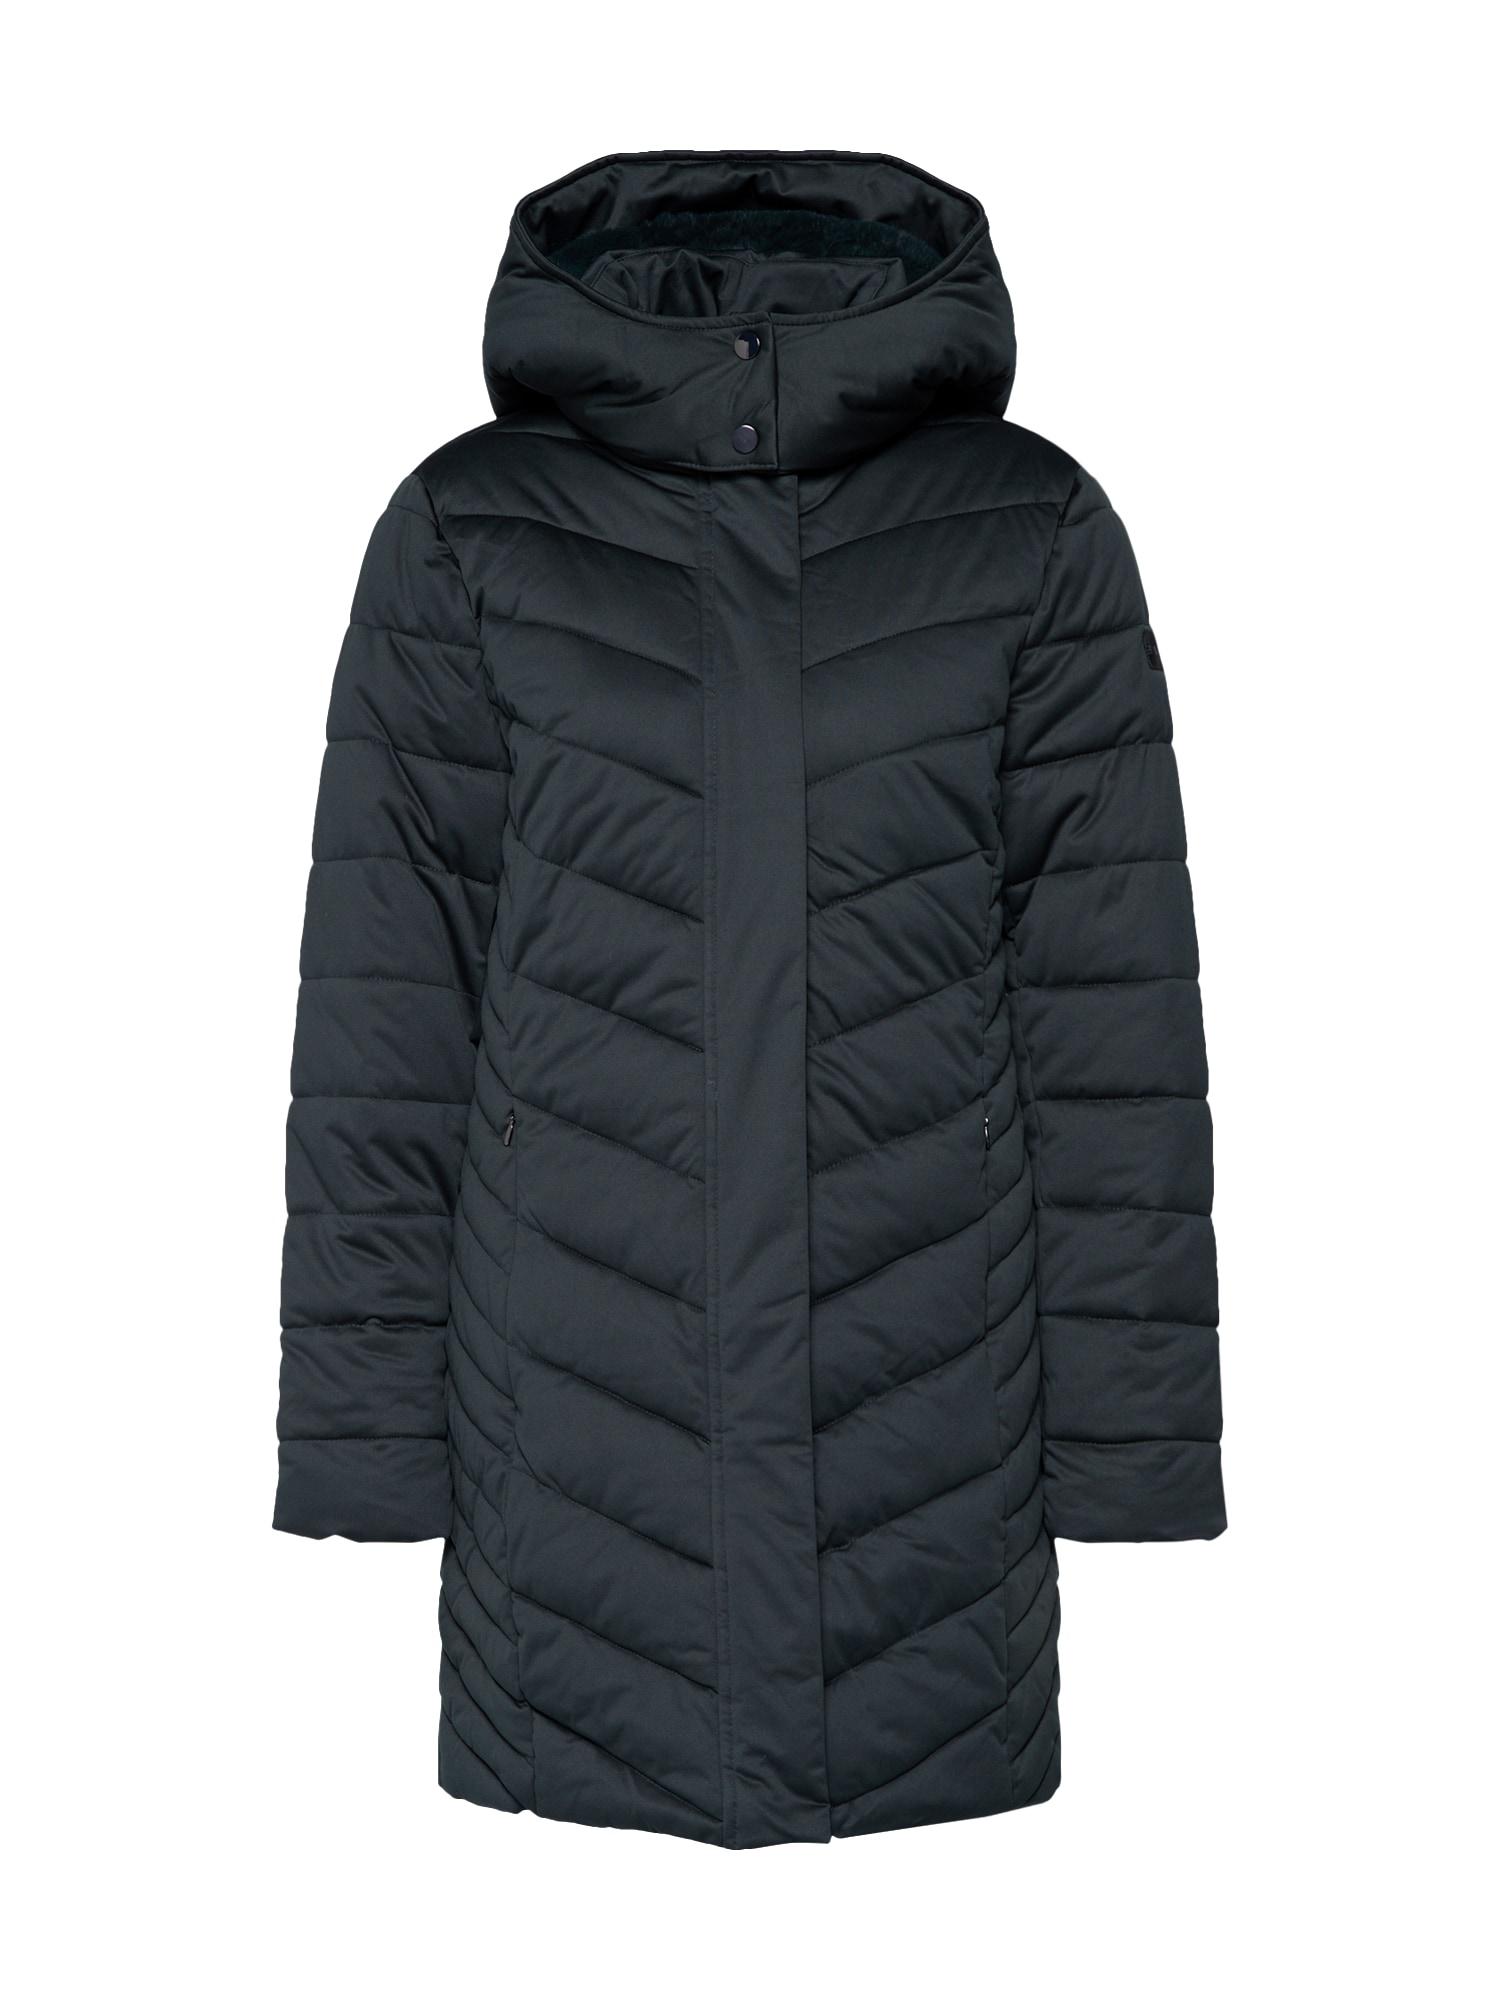 Zimní kabát Polyfiller jedle ESPRIT